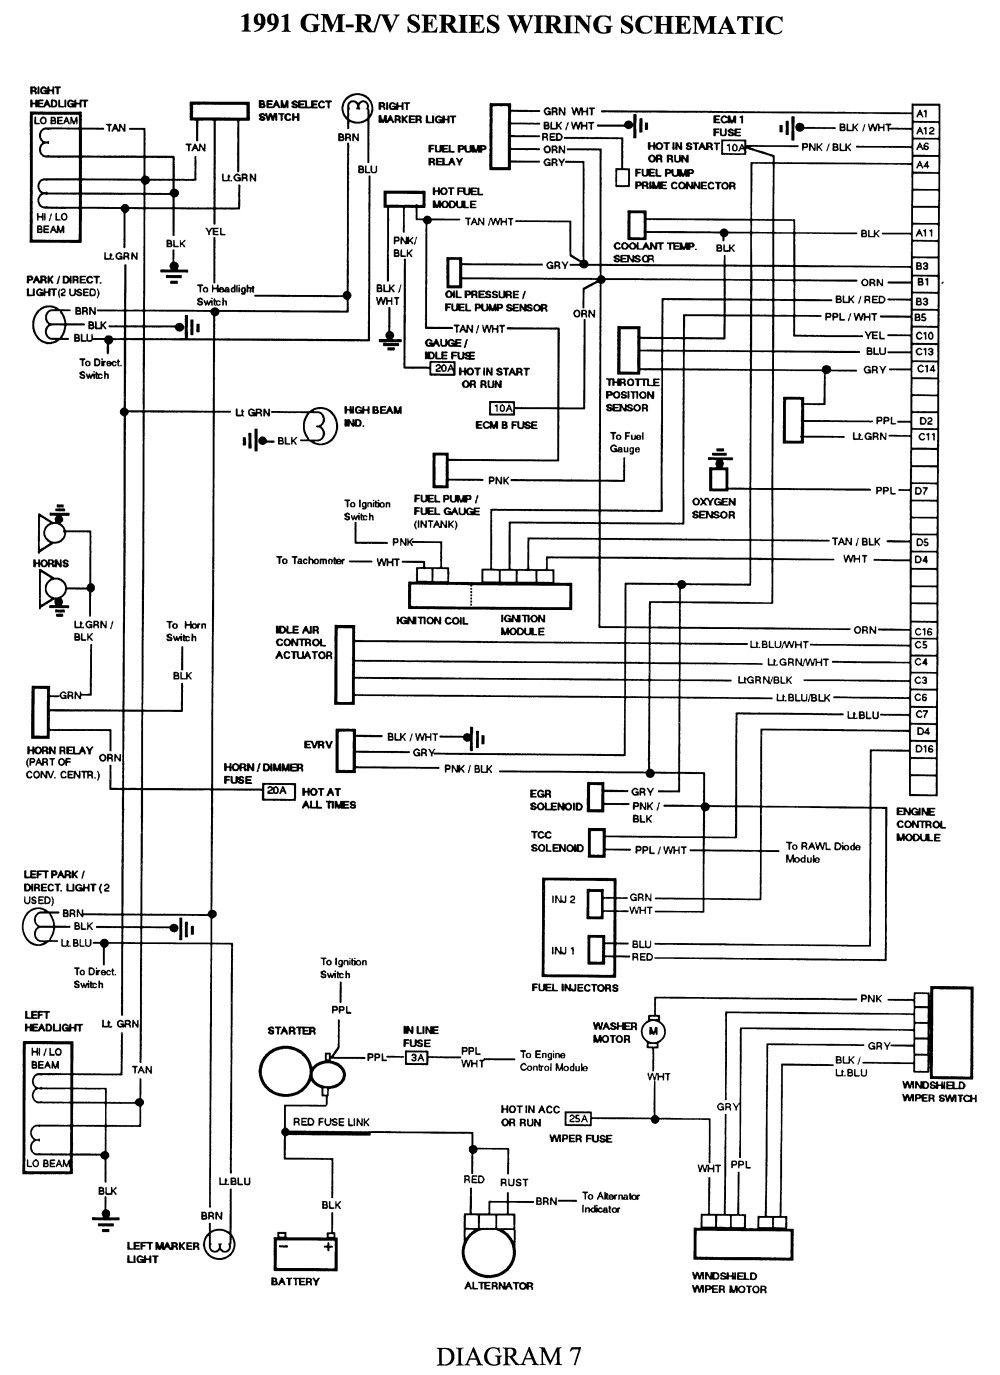 87 S10 Wiring Diagram Pdf Wiring Auto Wiring Diagrams Instructions Trailer Wiring Diagram Diagram Electrical Diagram